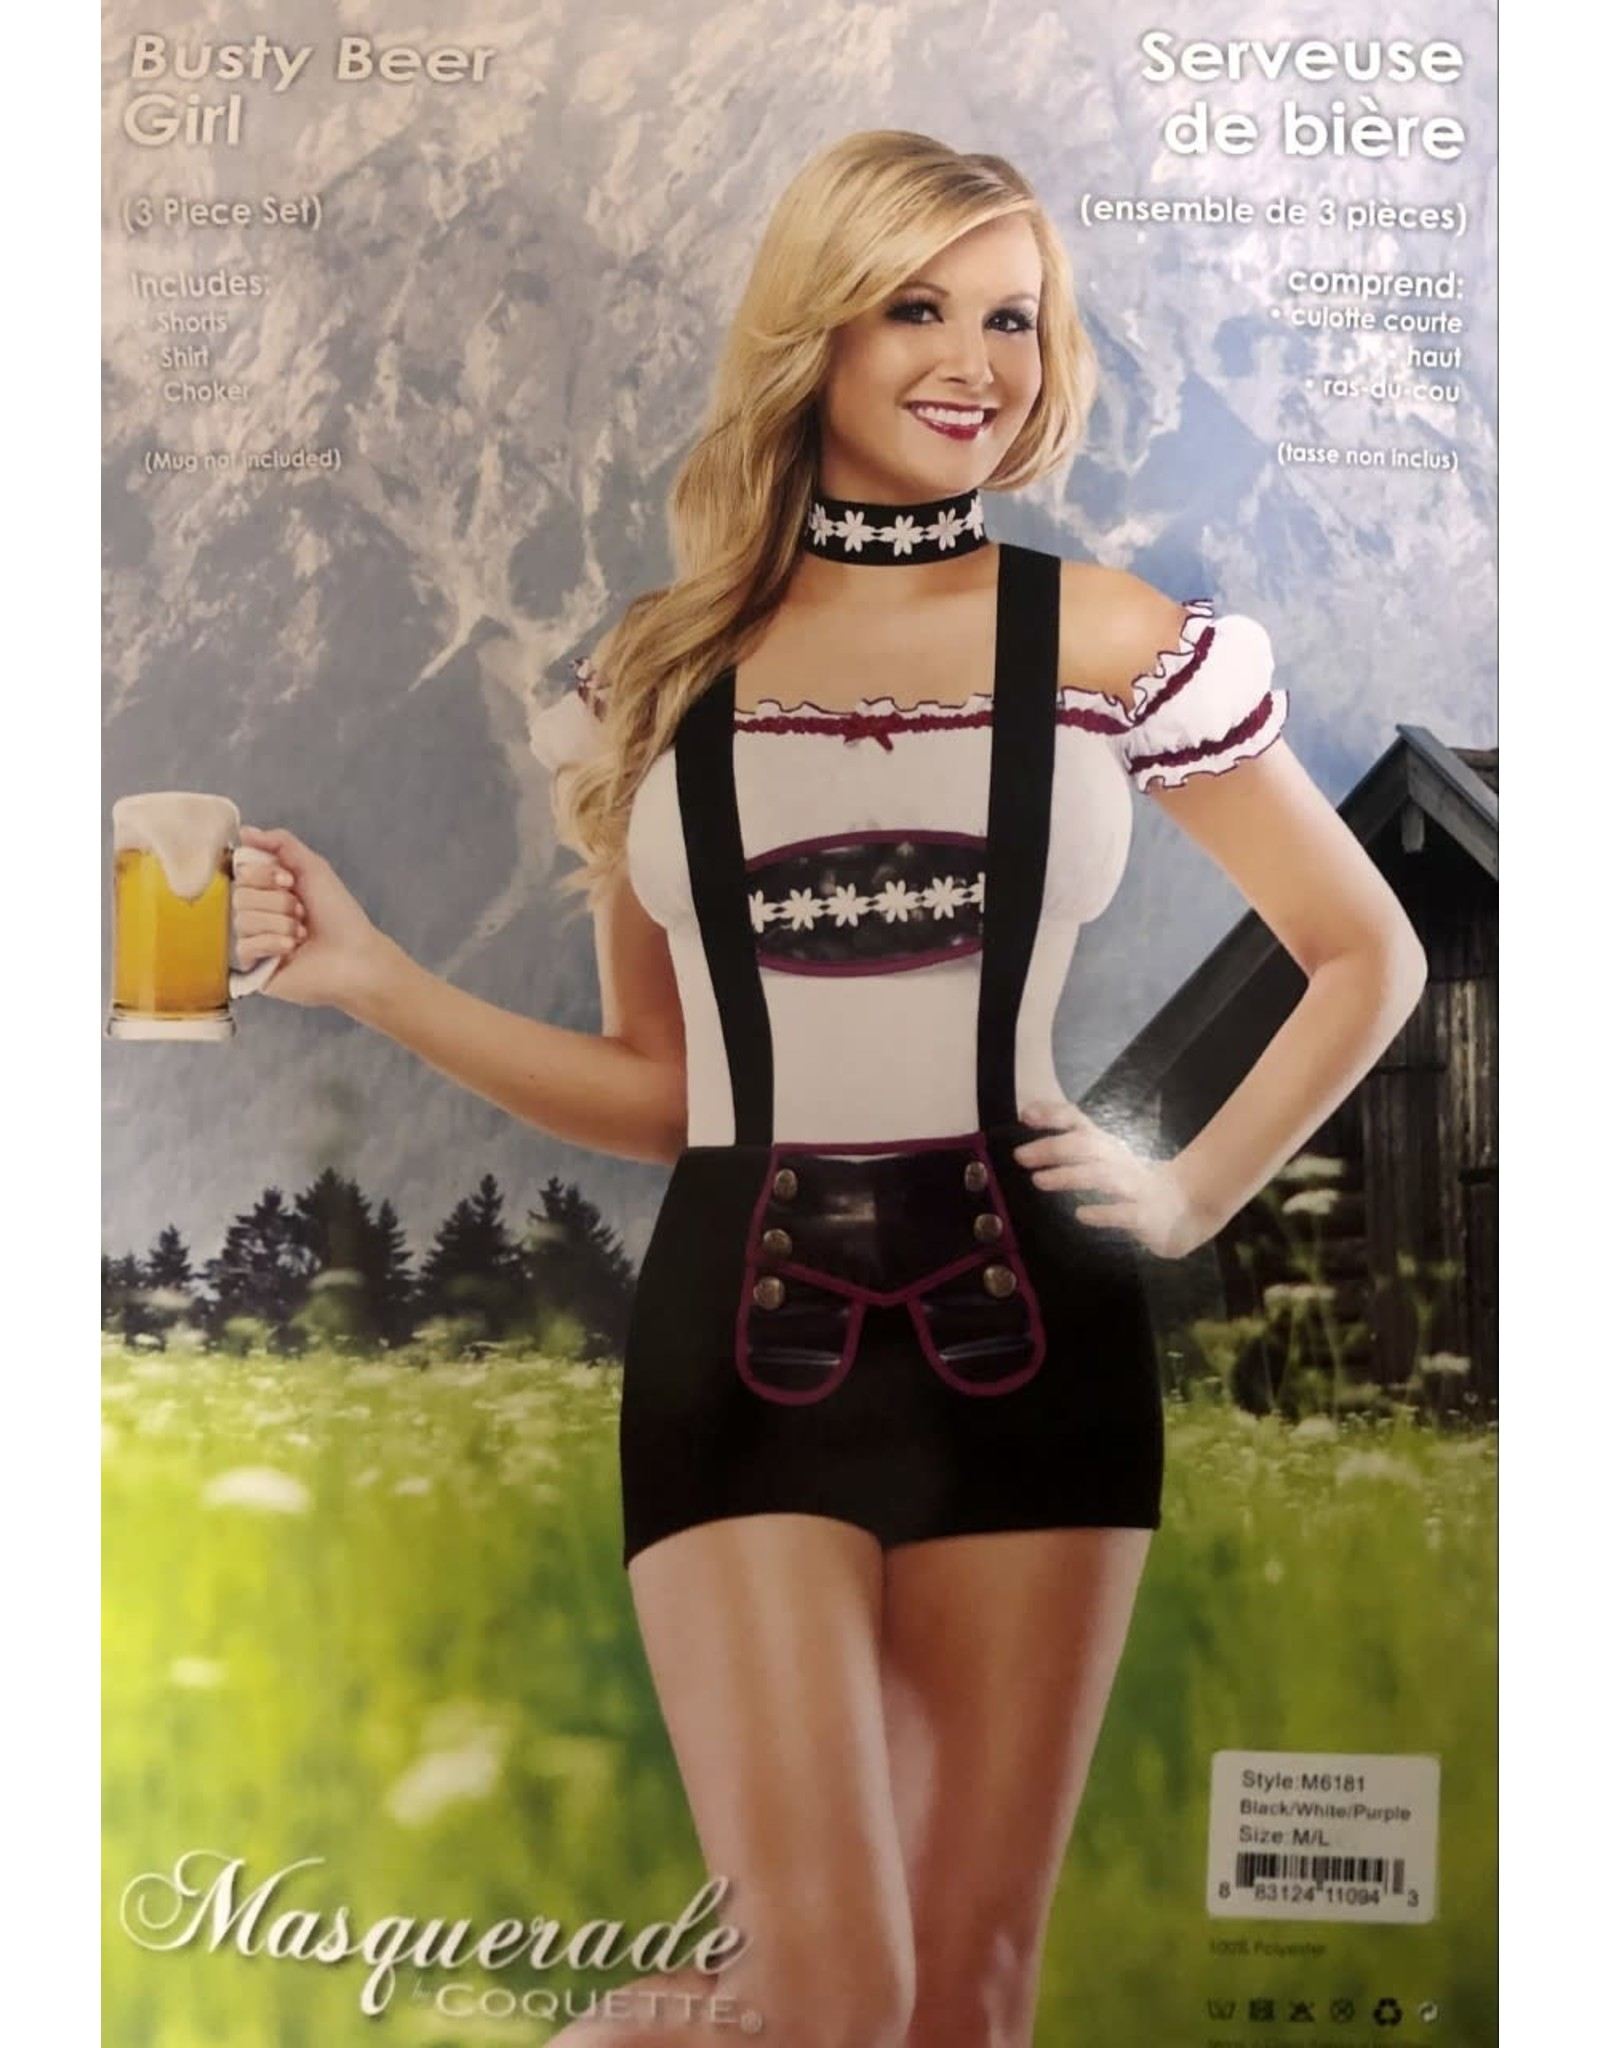 Coquette Busty Beer Girl